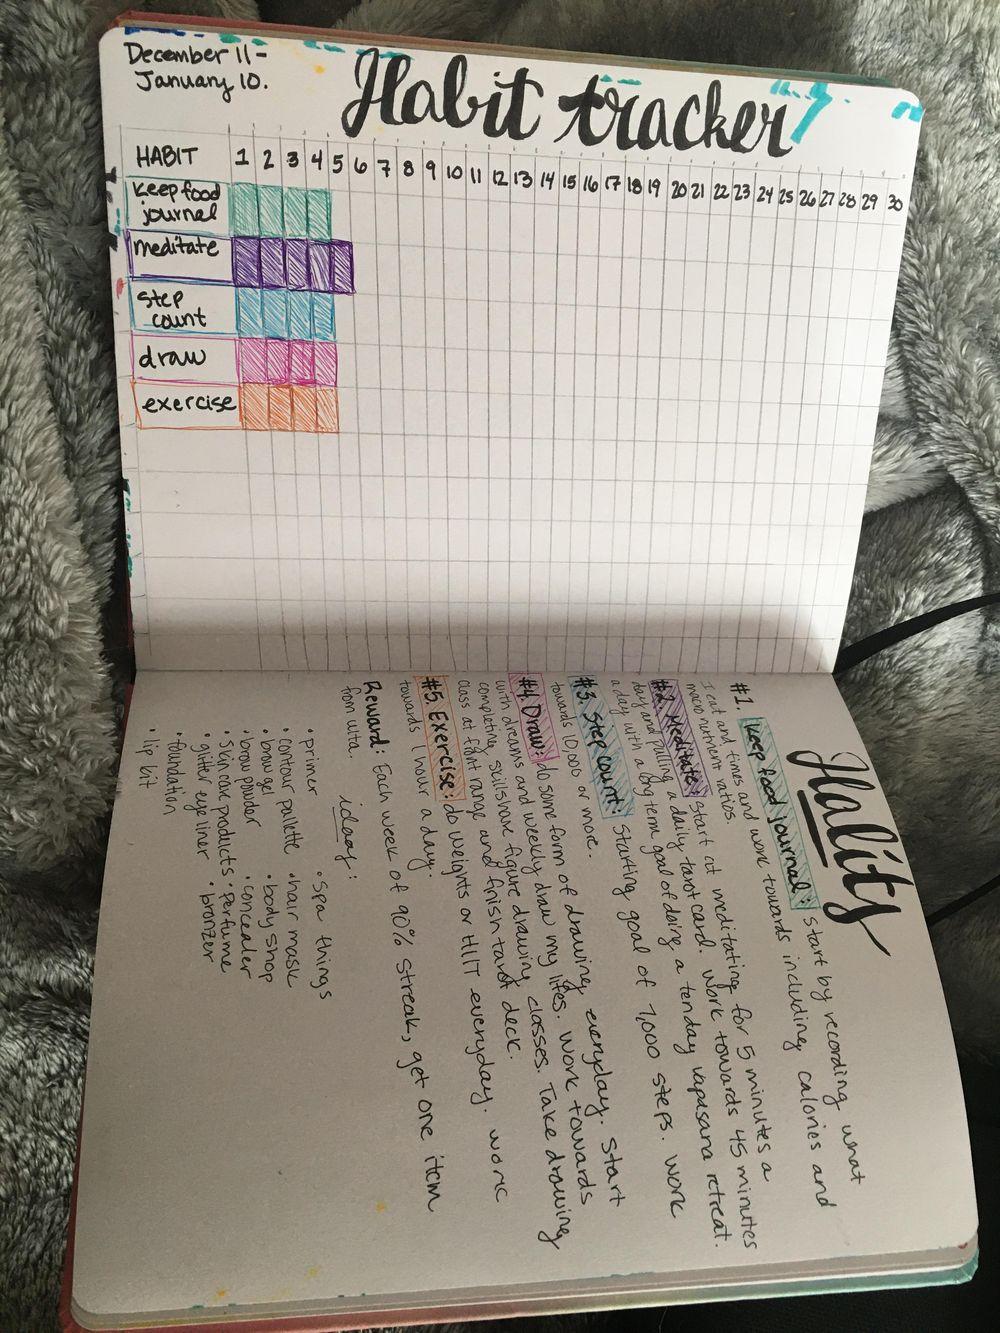 My Habit Tracker - image 1 - student project